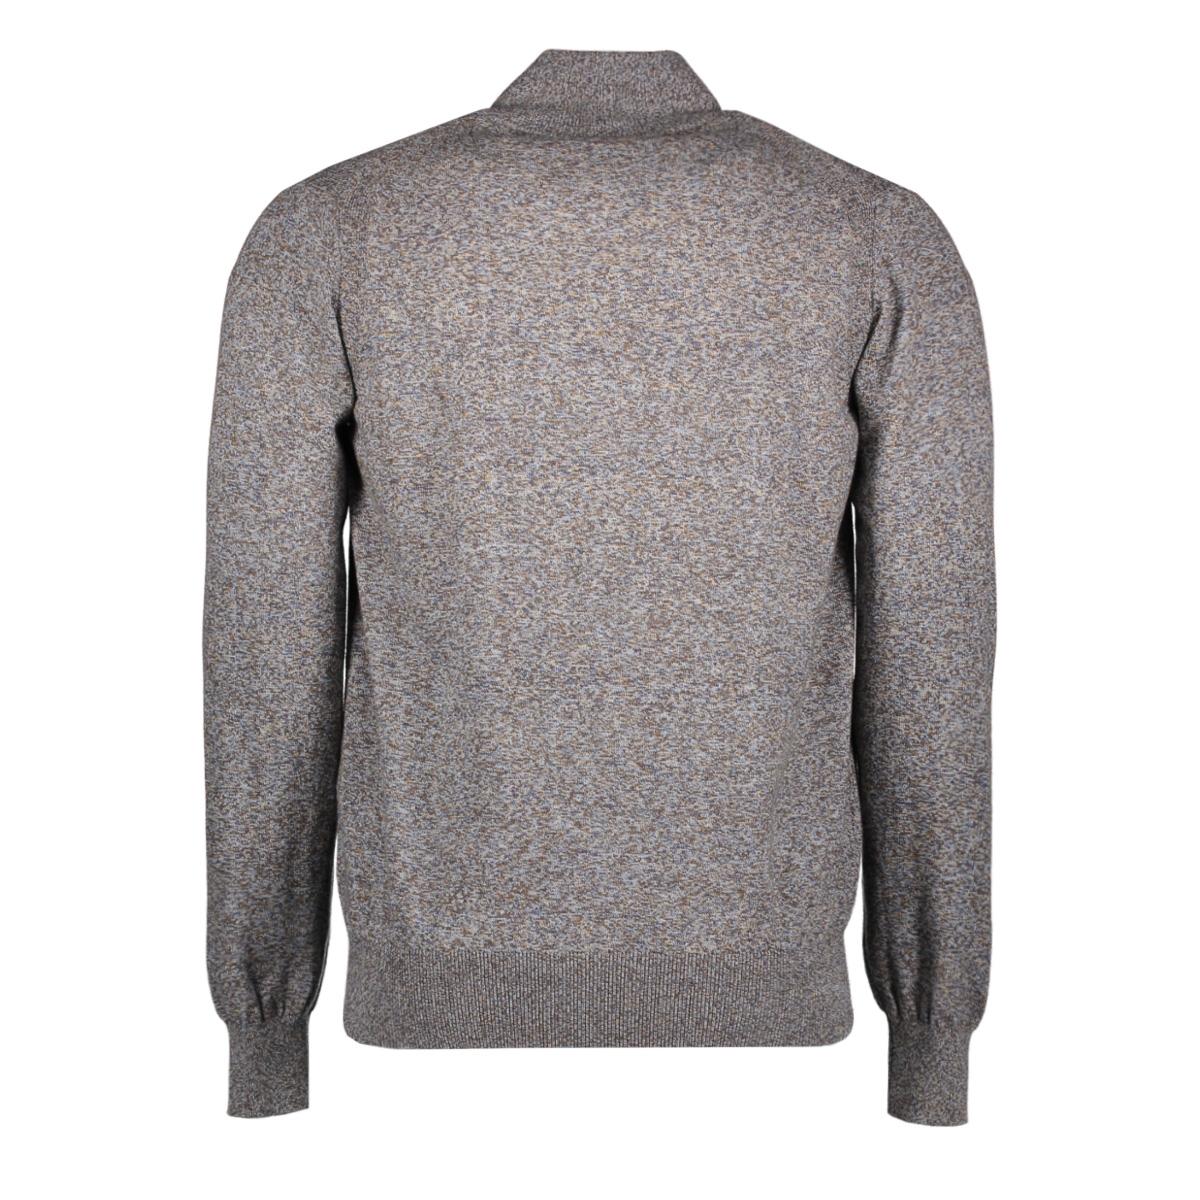 161-37061 bluefields vest 5984